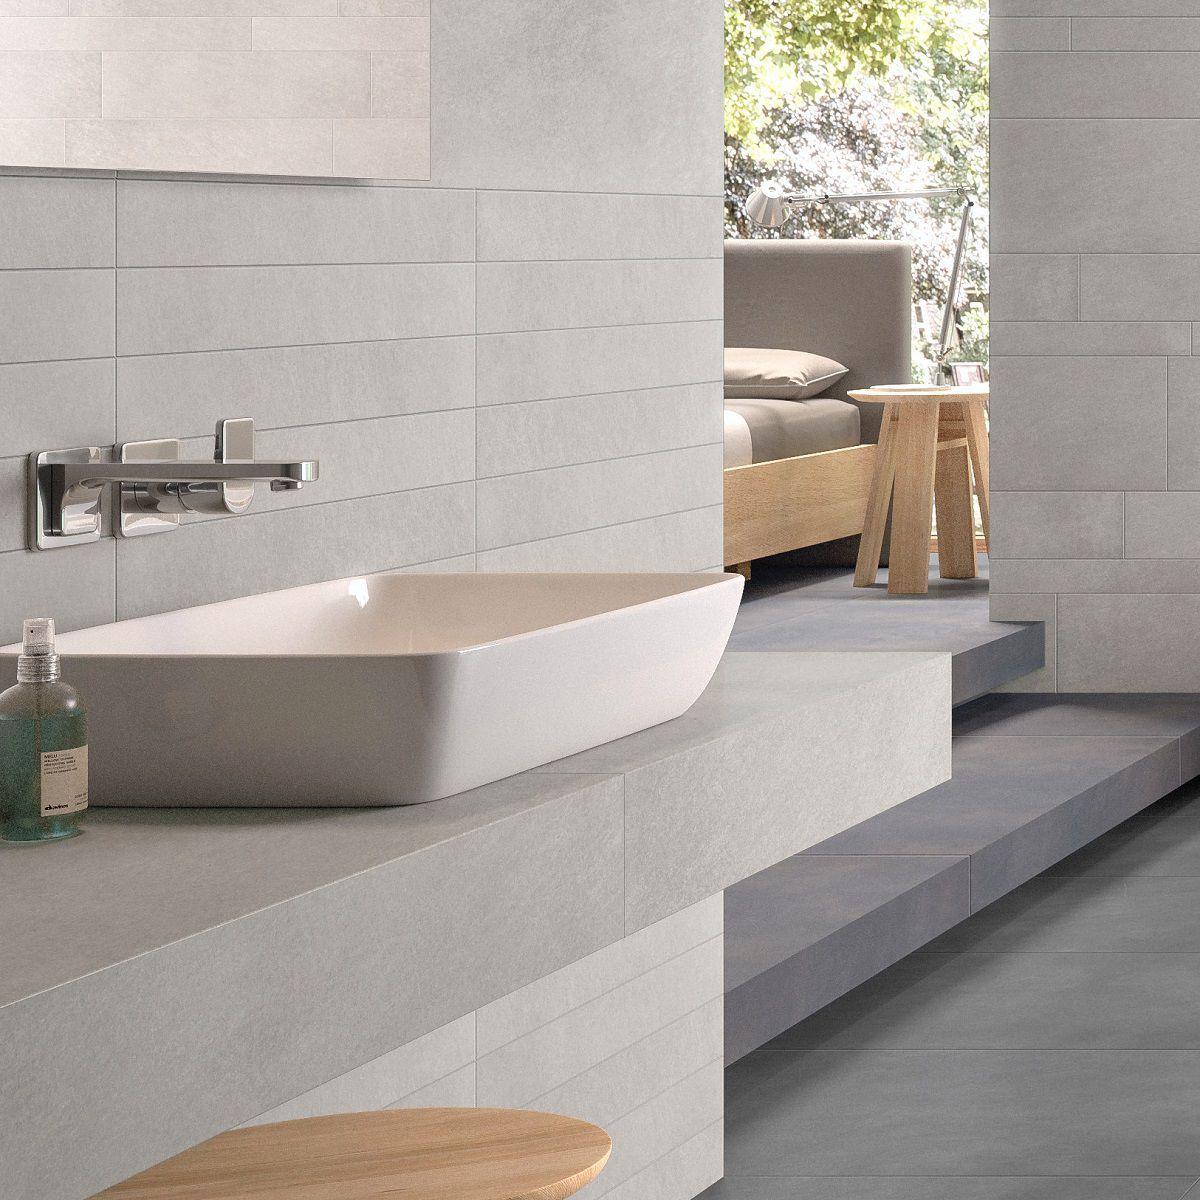 Villeroy And Boch Artis Rectangular Washbowl Steam Showers Bathroom Villeroy Boch Luxury Bathroom